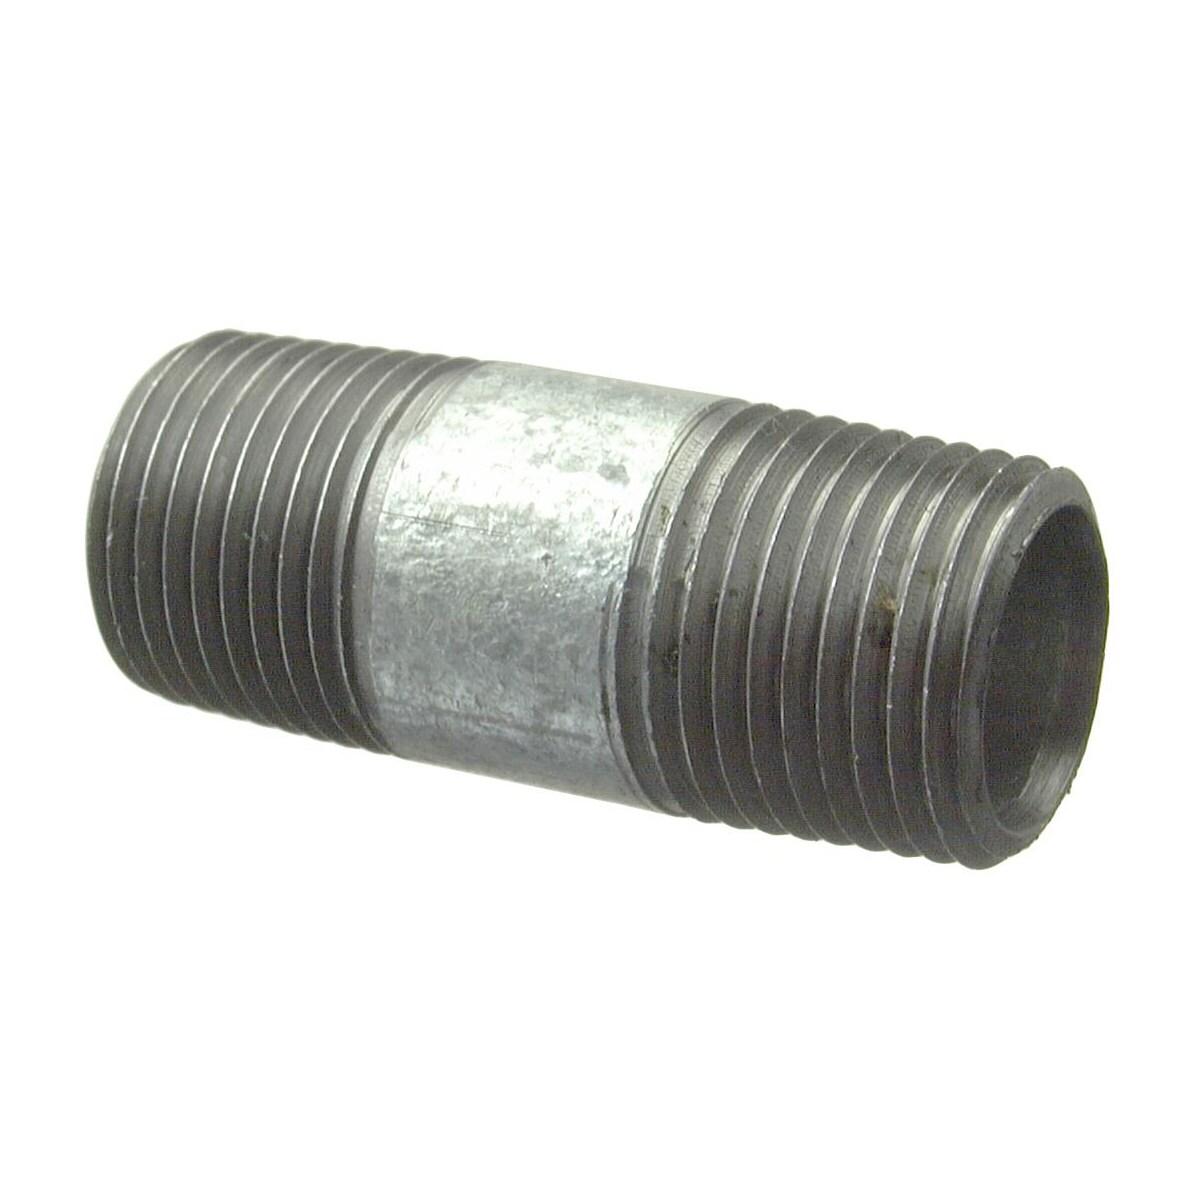 "Halex 64313 1"" X 2"" Conduit Nipple (Other electrical), Black"